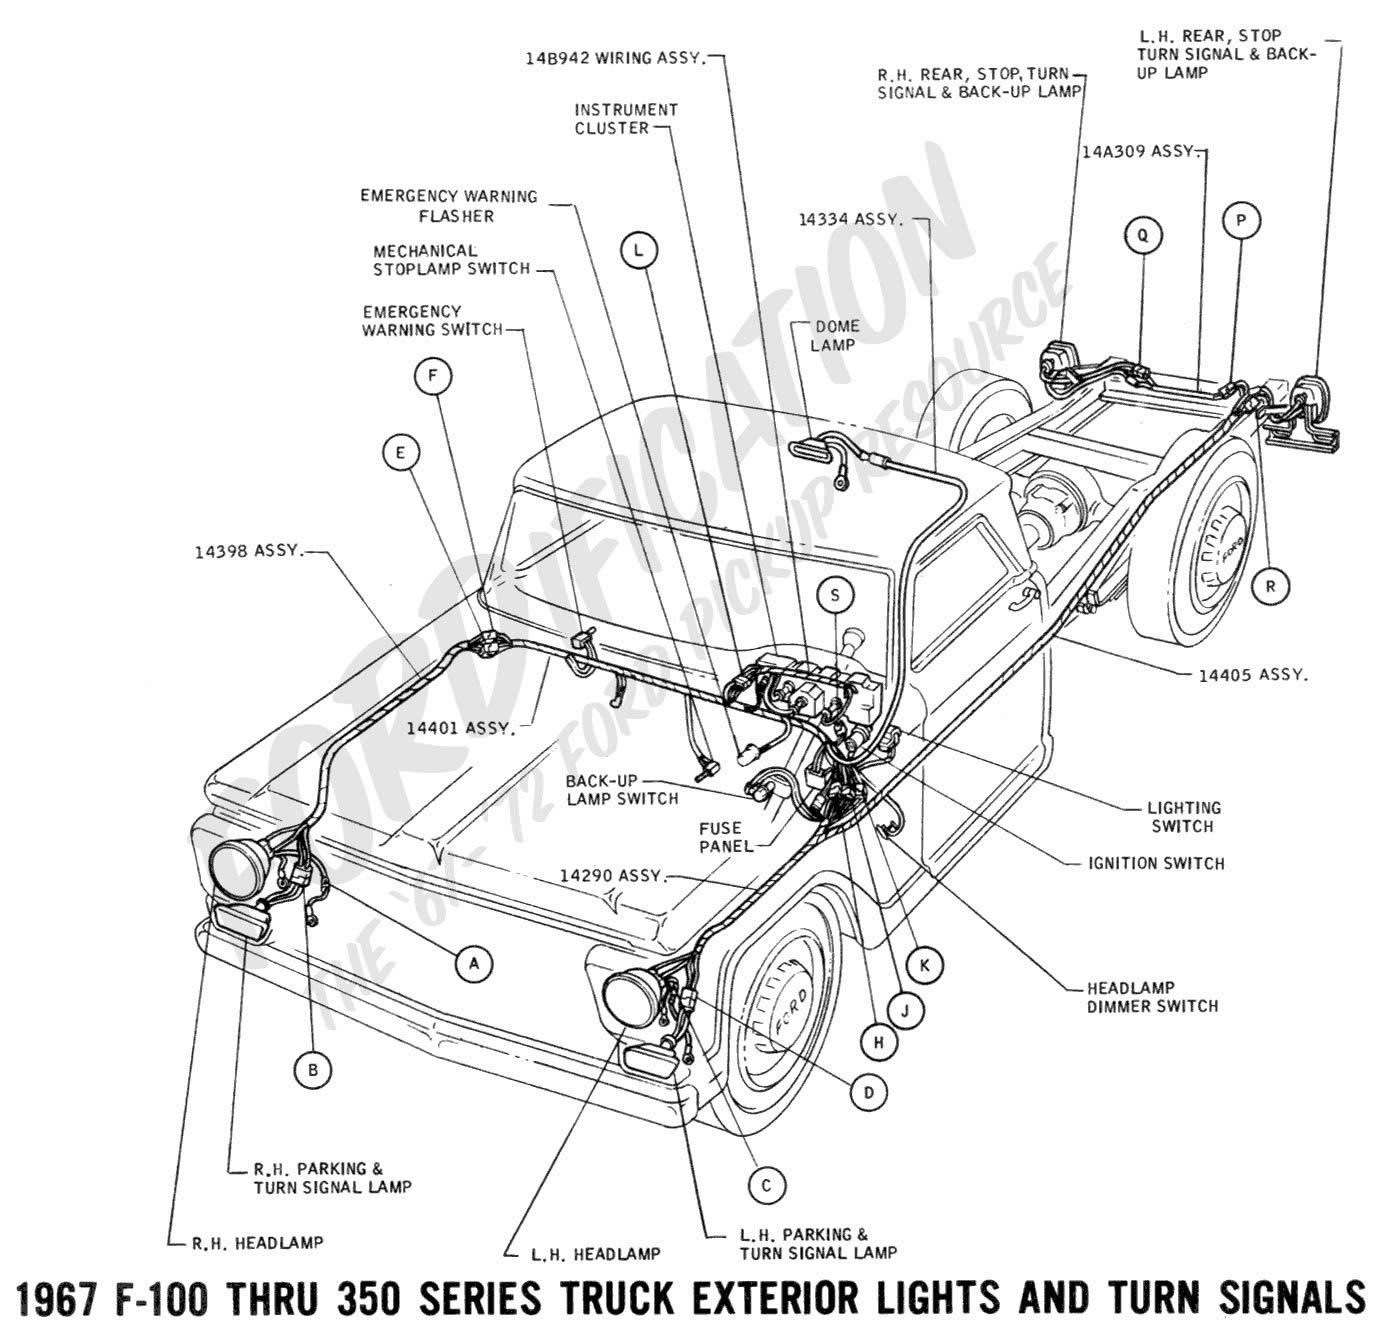 tail light wiring for 2002 chevy silverado